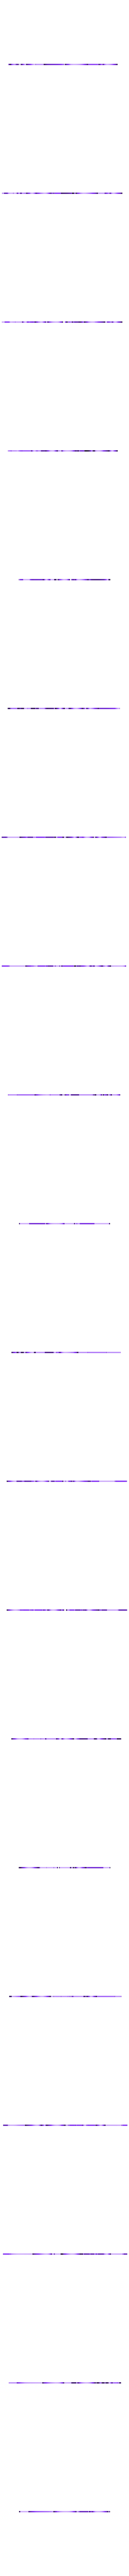 clock-stl.STL Download STL file Clock Numbers • 3D printer object, svandalk